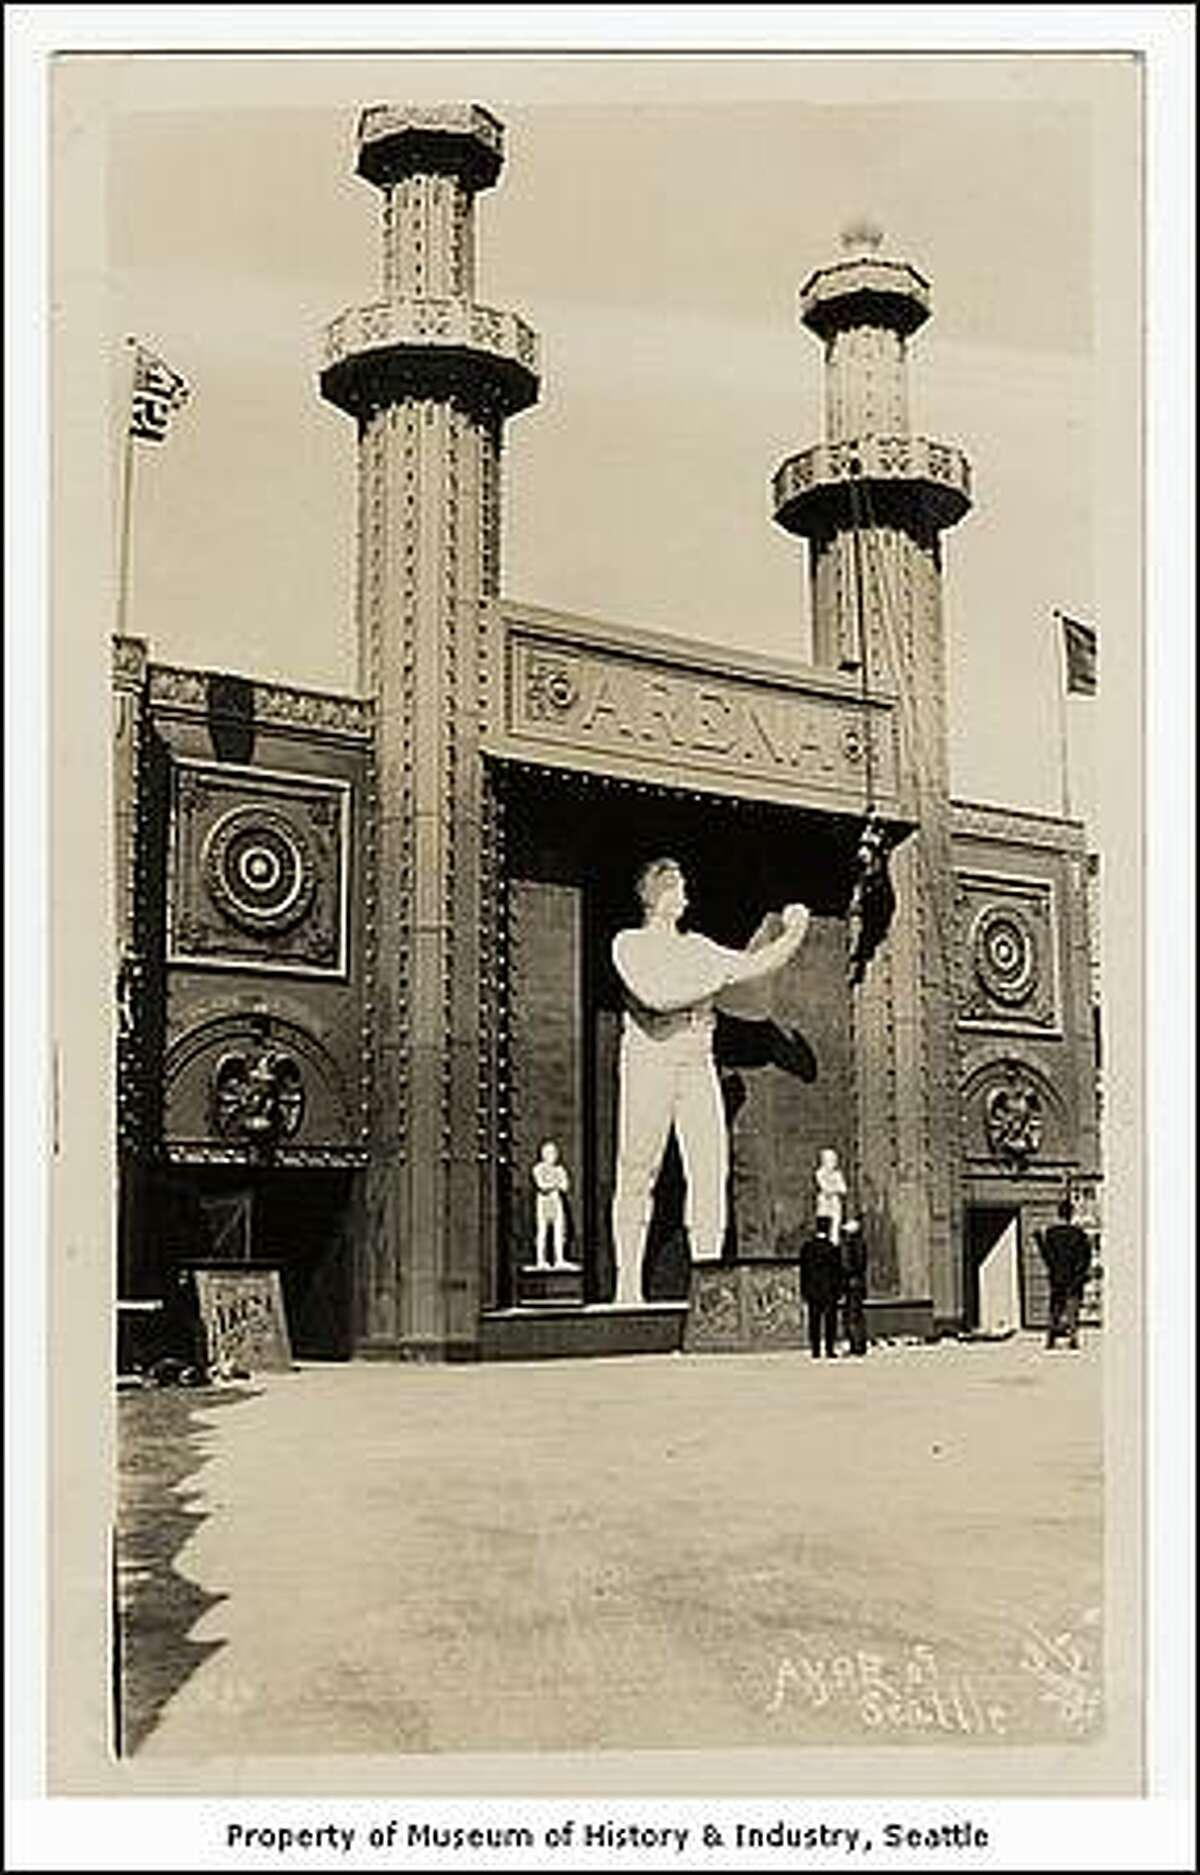 Arena Theatre, Pay Streak at the Alaska Yukon Pacific Exposition in Seattle in 1909. (Otto Daniel Goetze/MOHAI)